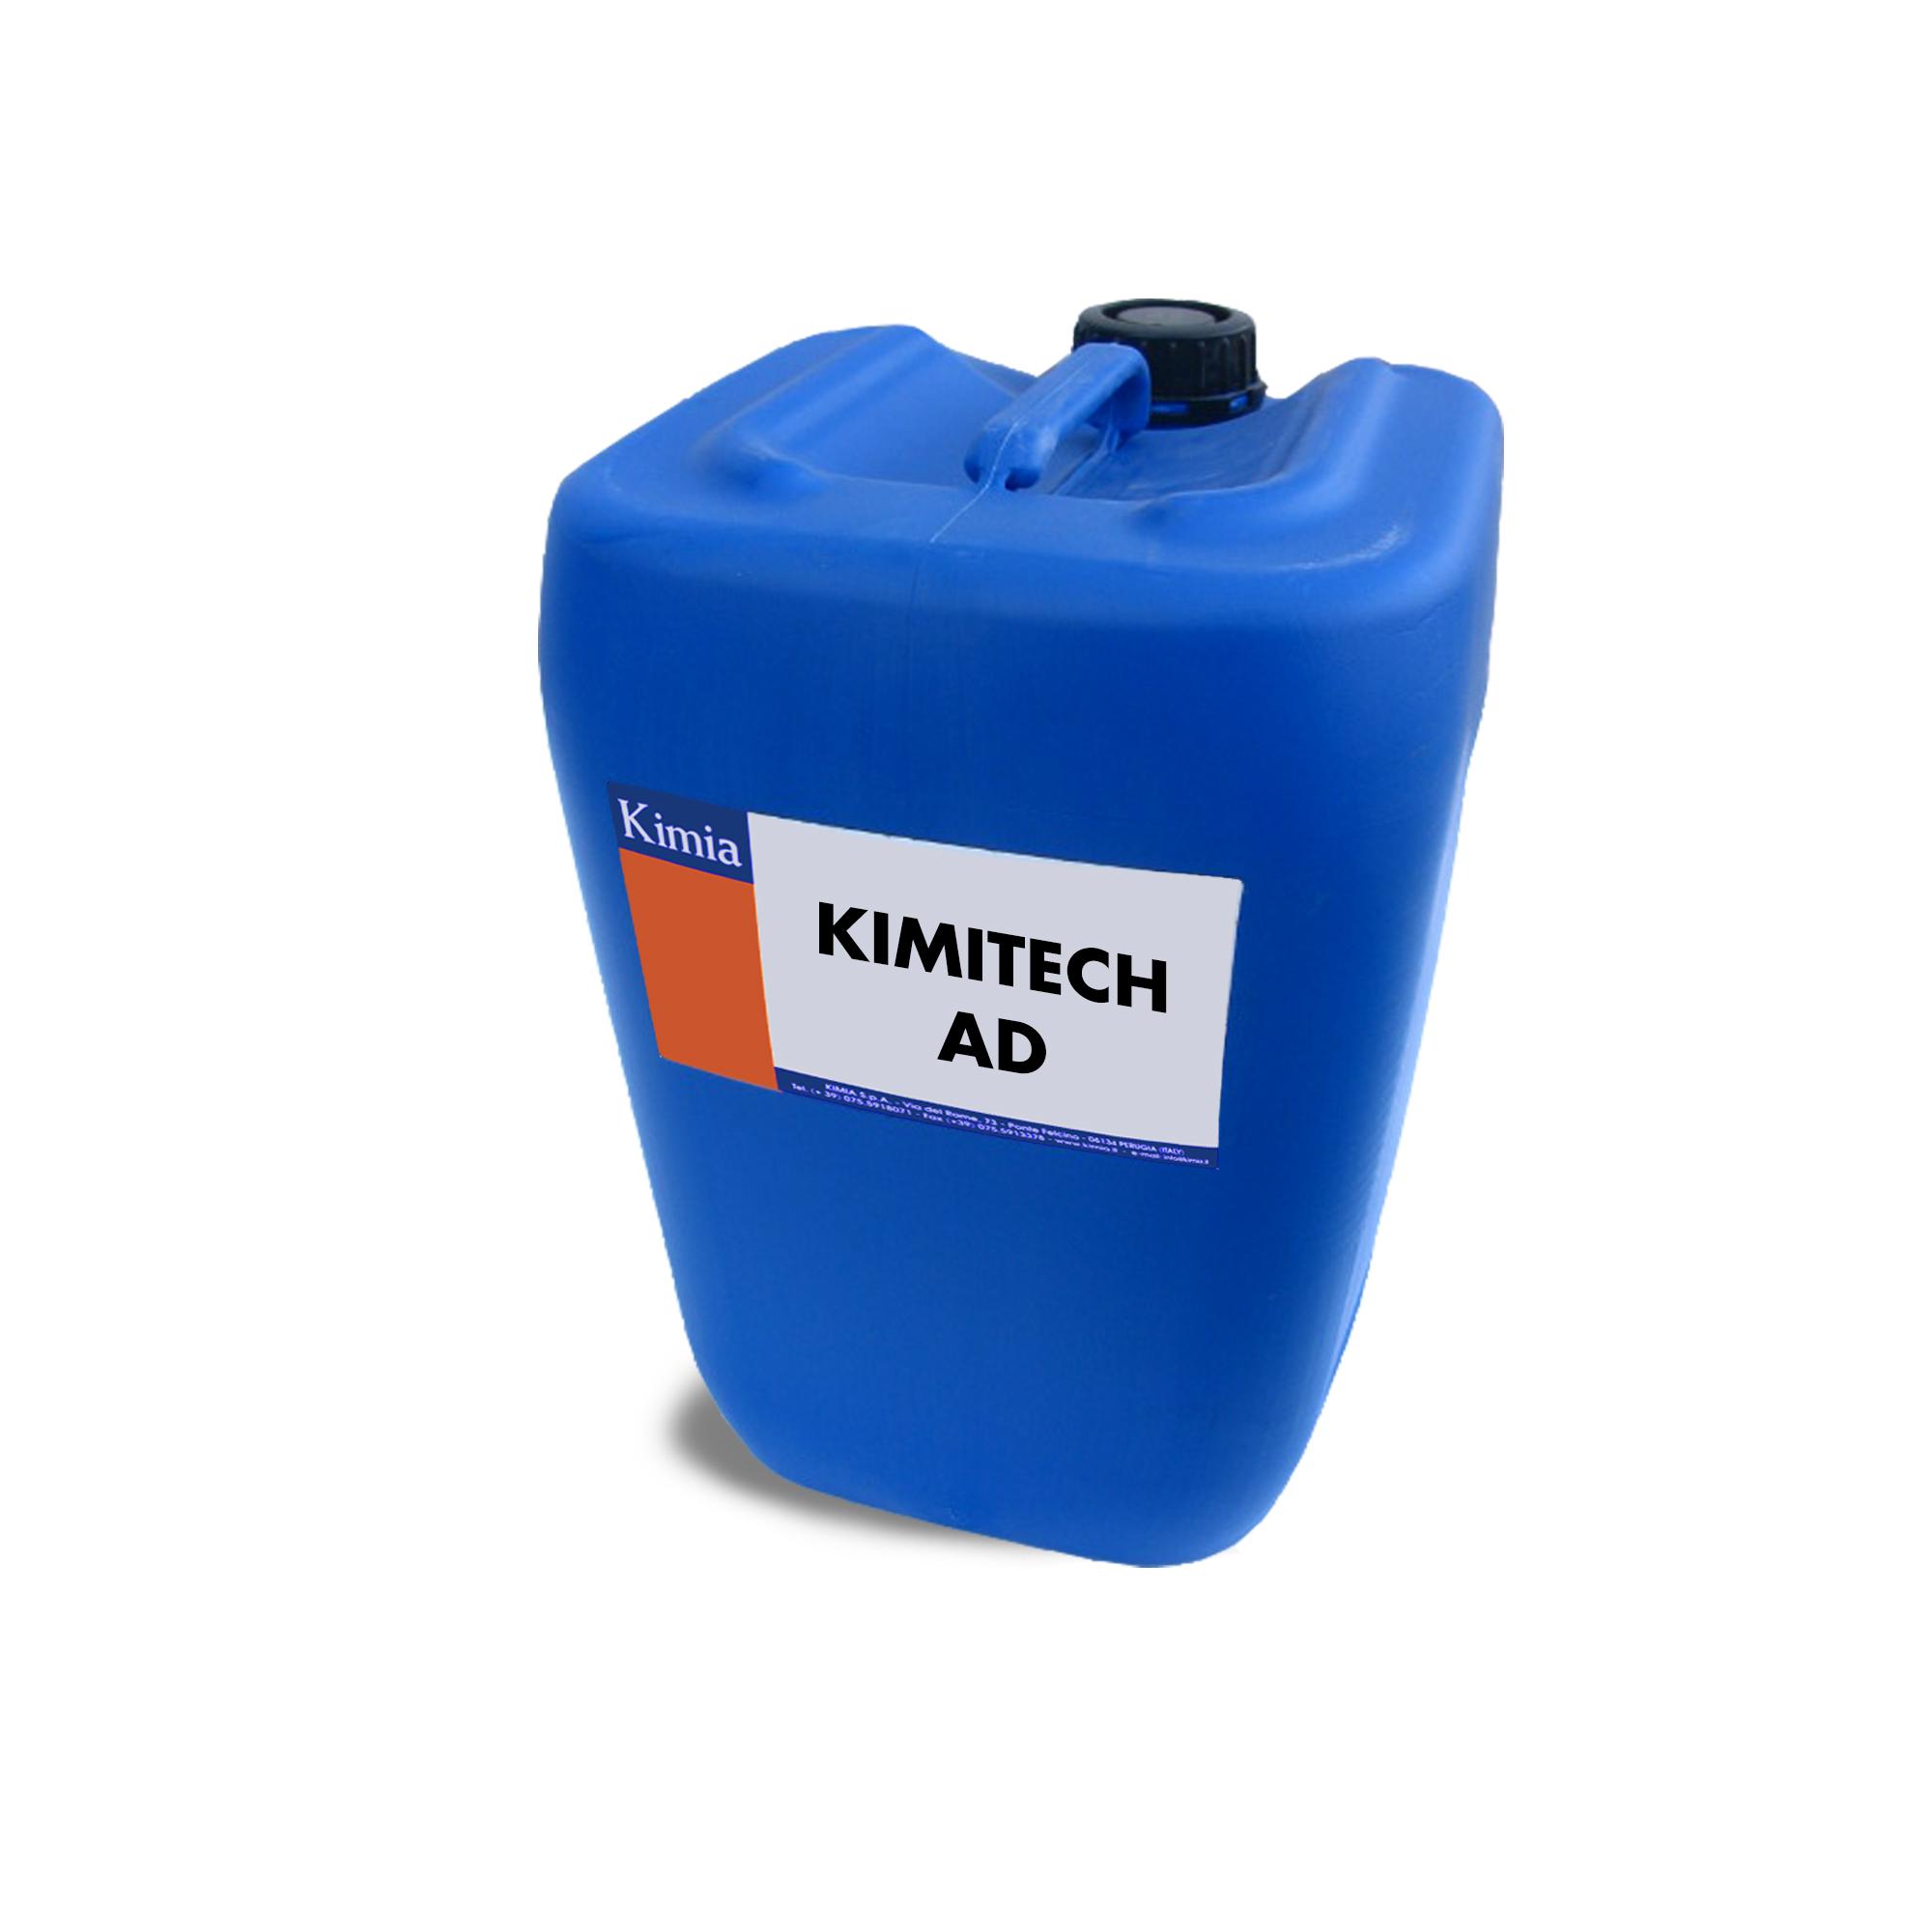 Kimitech AD